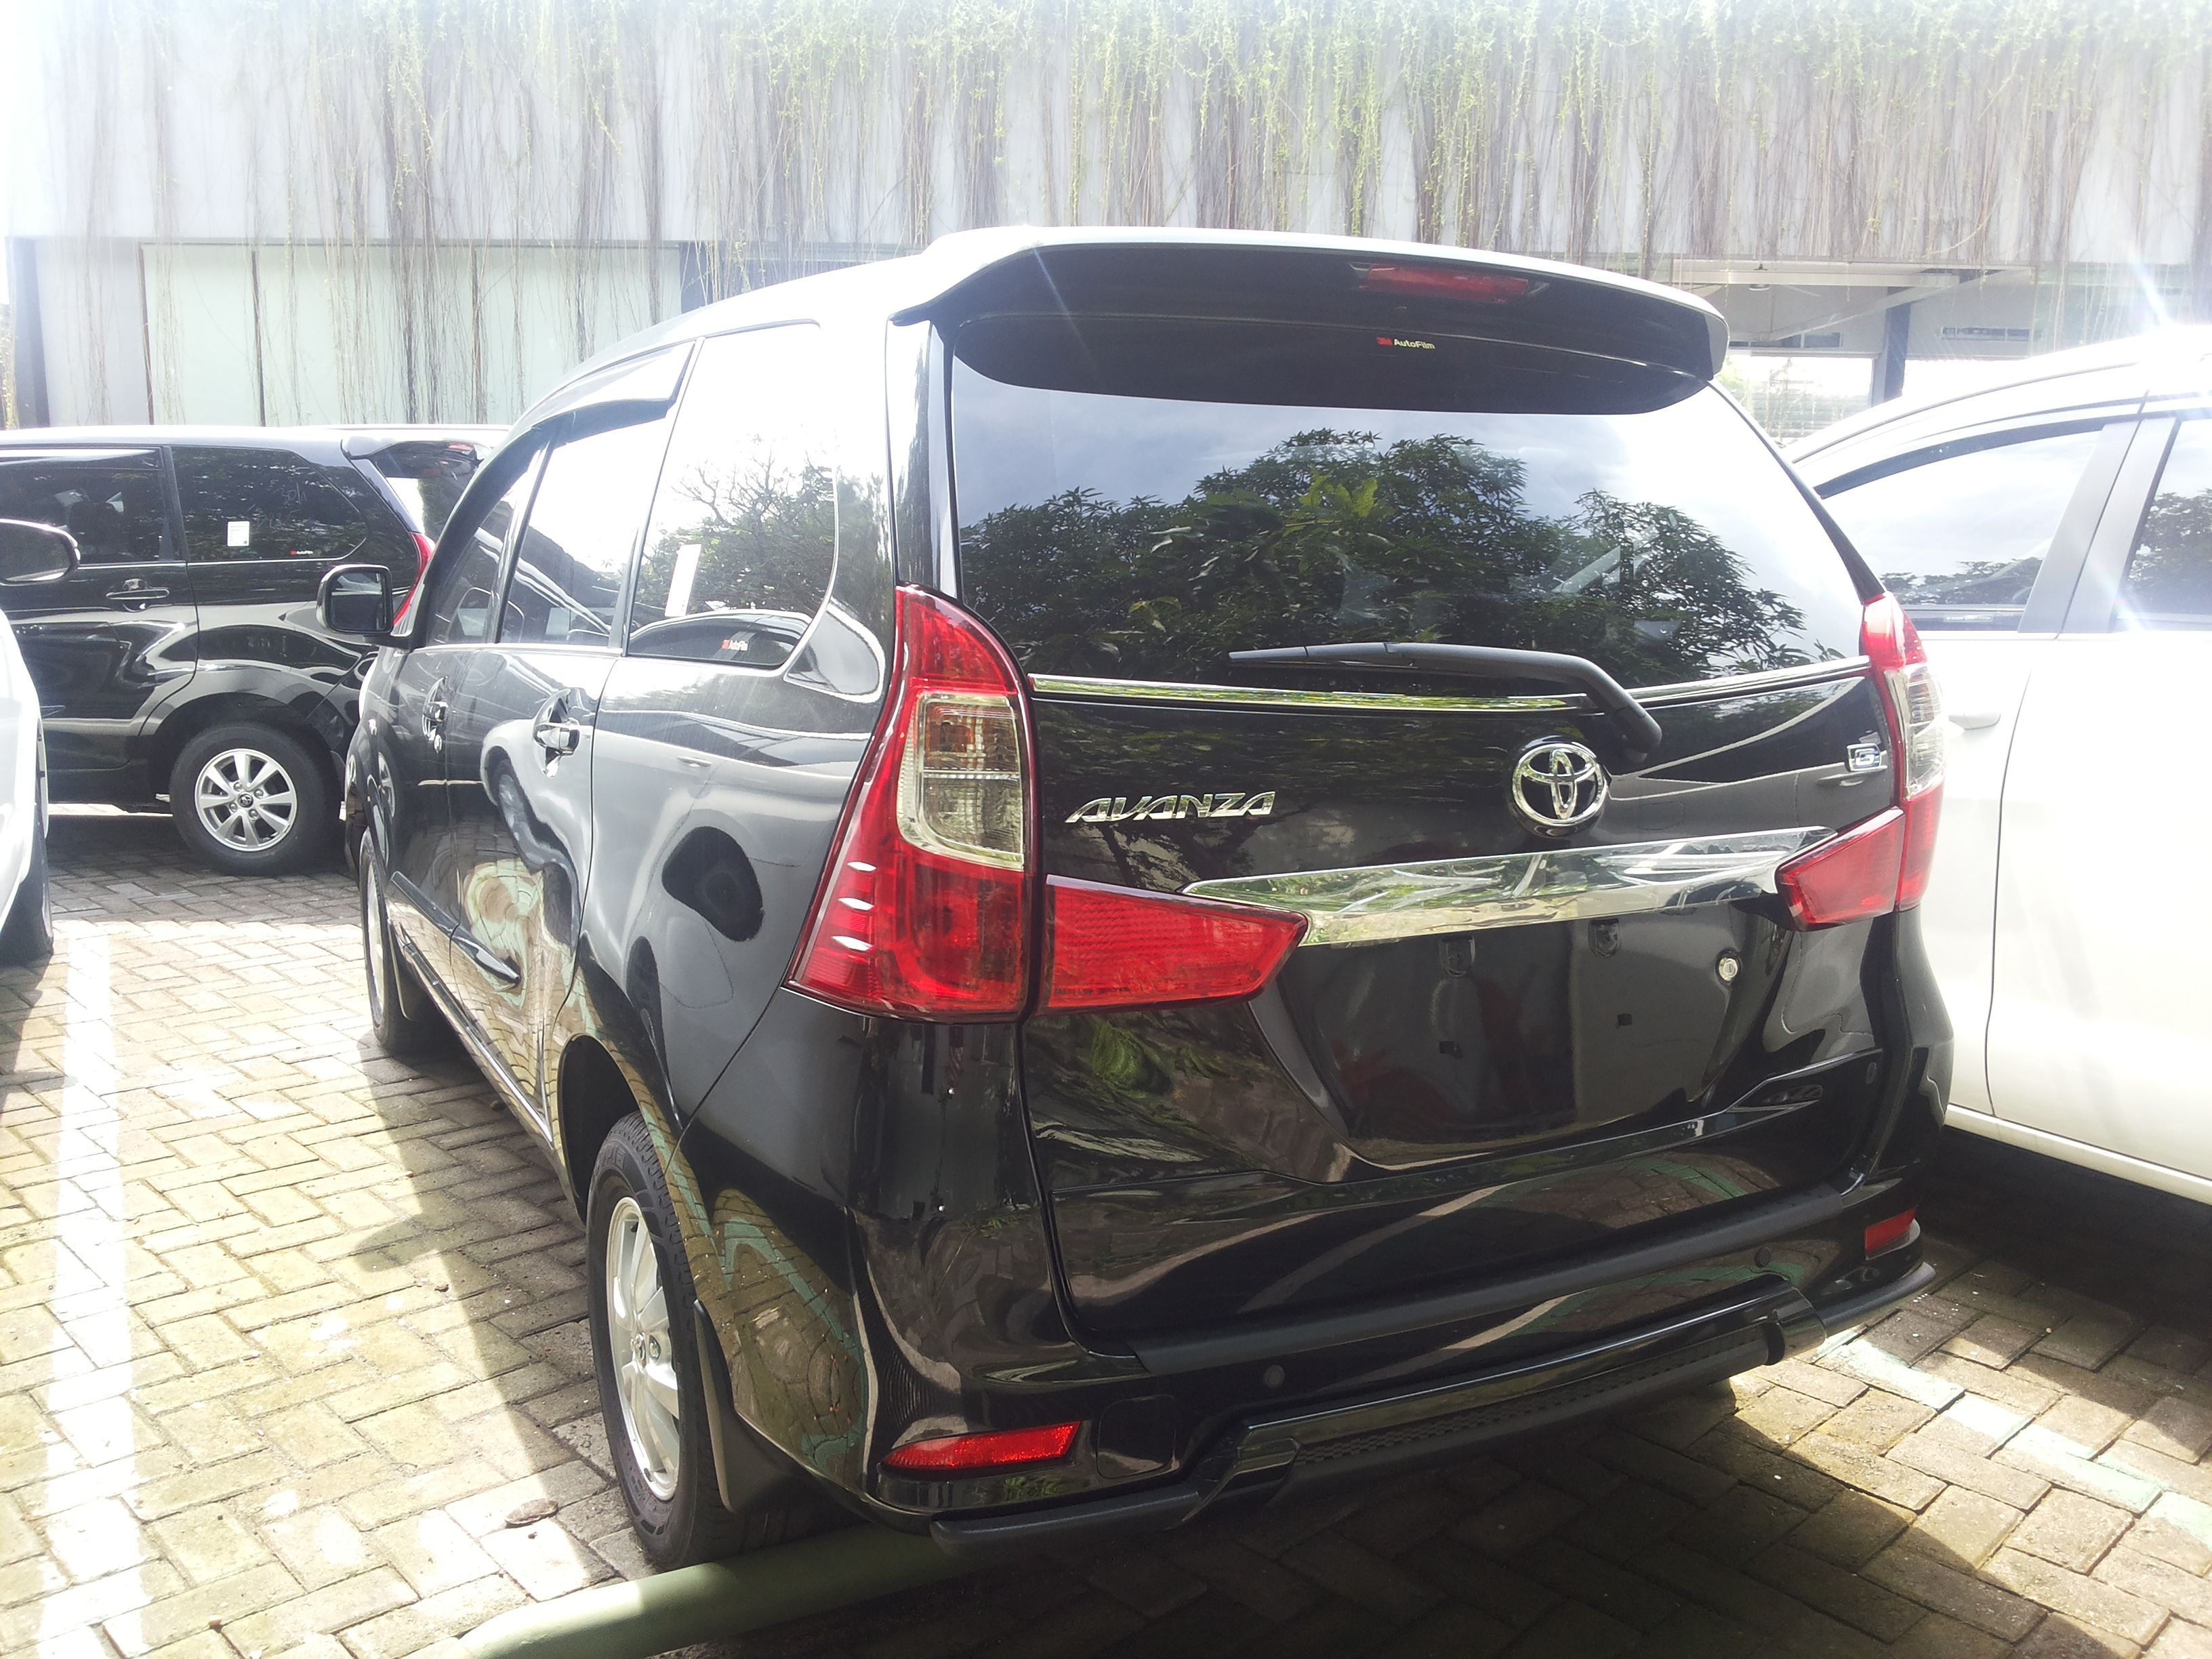 Bagian Belakang Grand New Avanza 1 3 G 2018 Unit Cepat Segera Booking Sekarang Juga Hubungi Kami Dan Dapatkan Harga Terbaik Disini I Toyota Surabaya